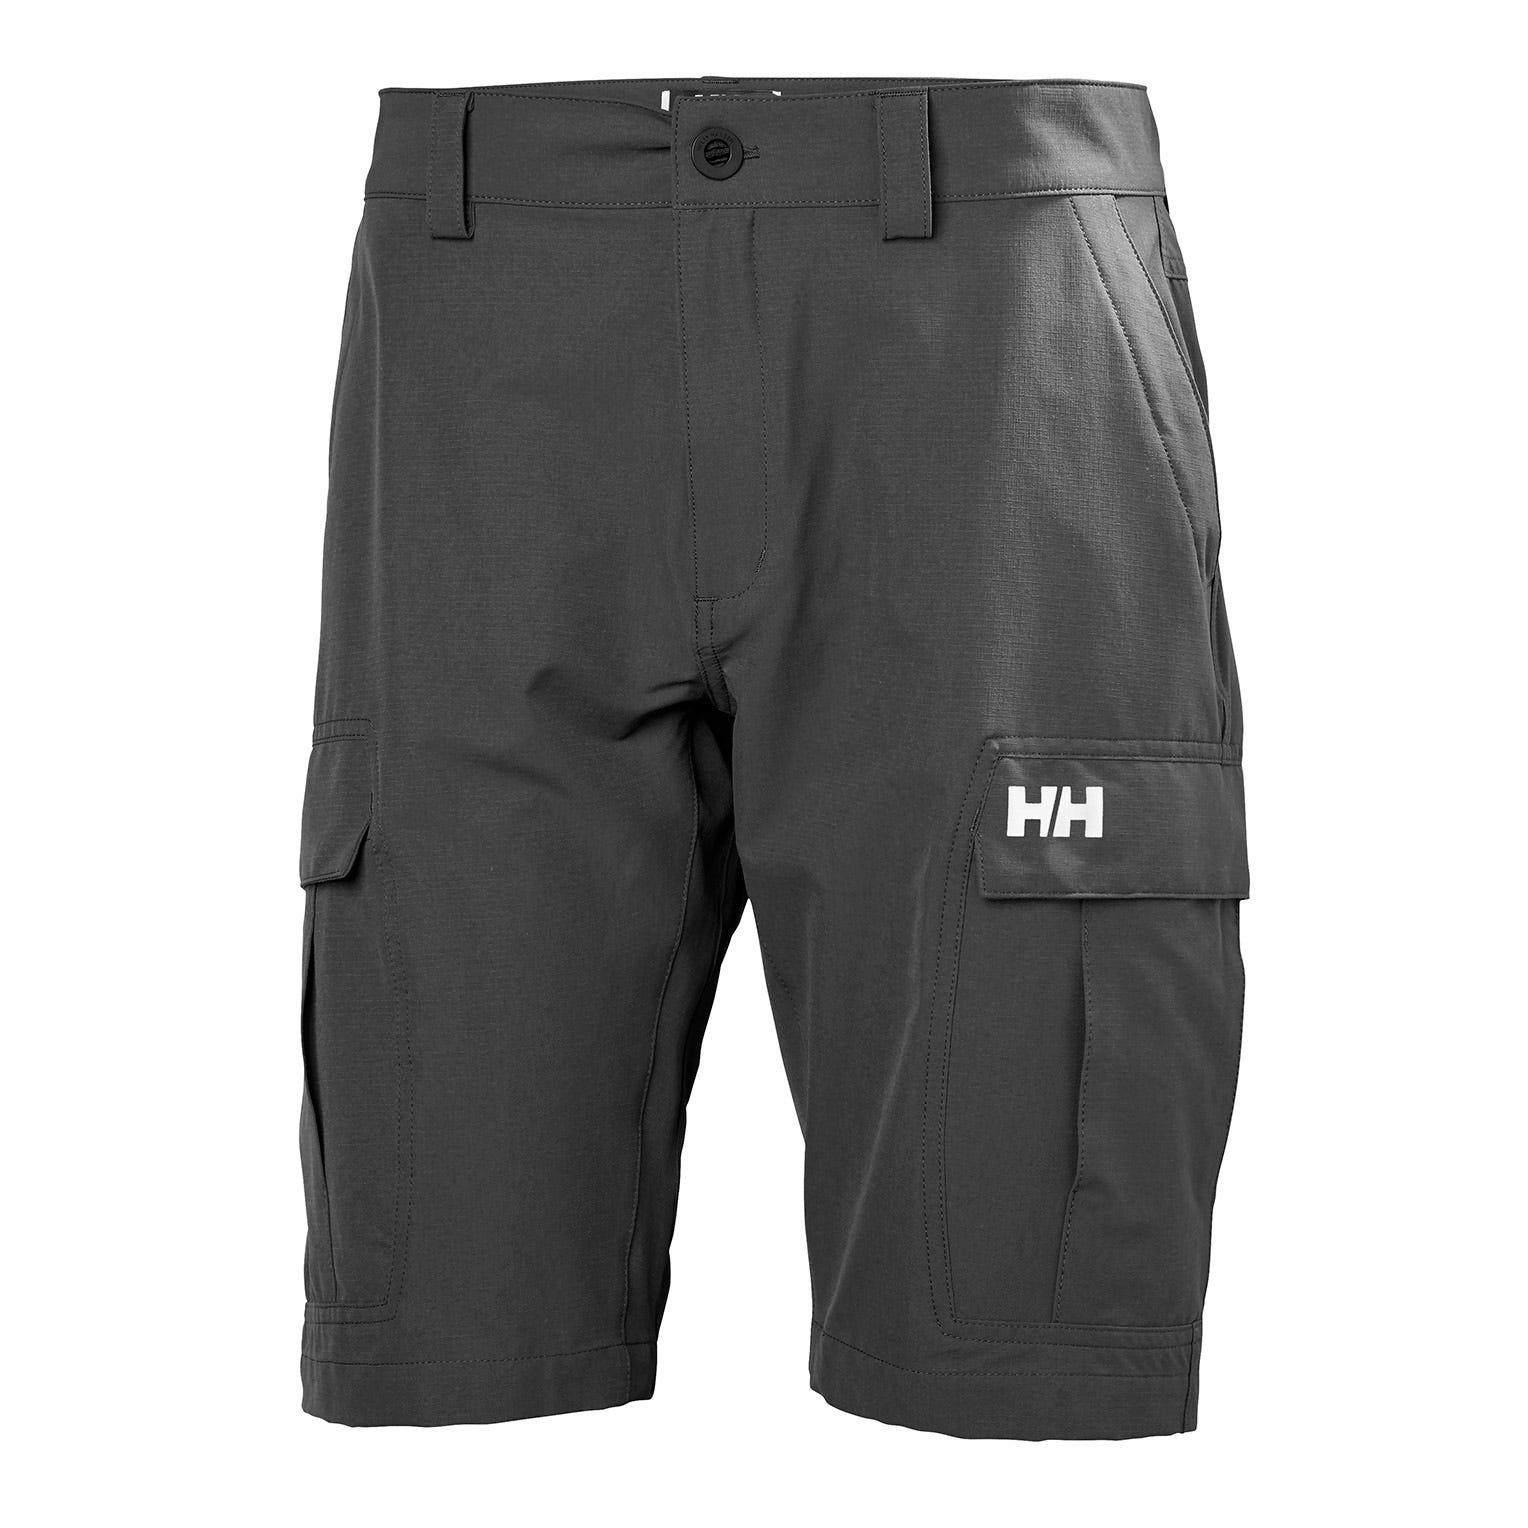 Helly Hansen Qd Cargo Shorts 11 Mens Sailing Pant Black 33